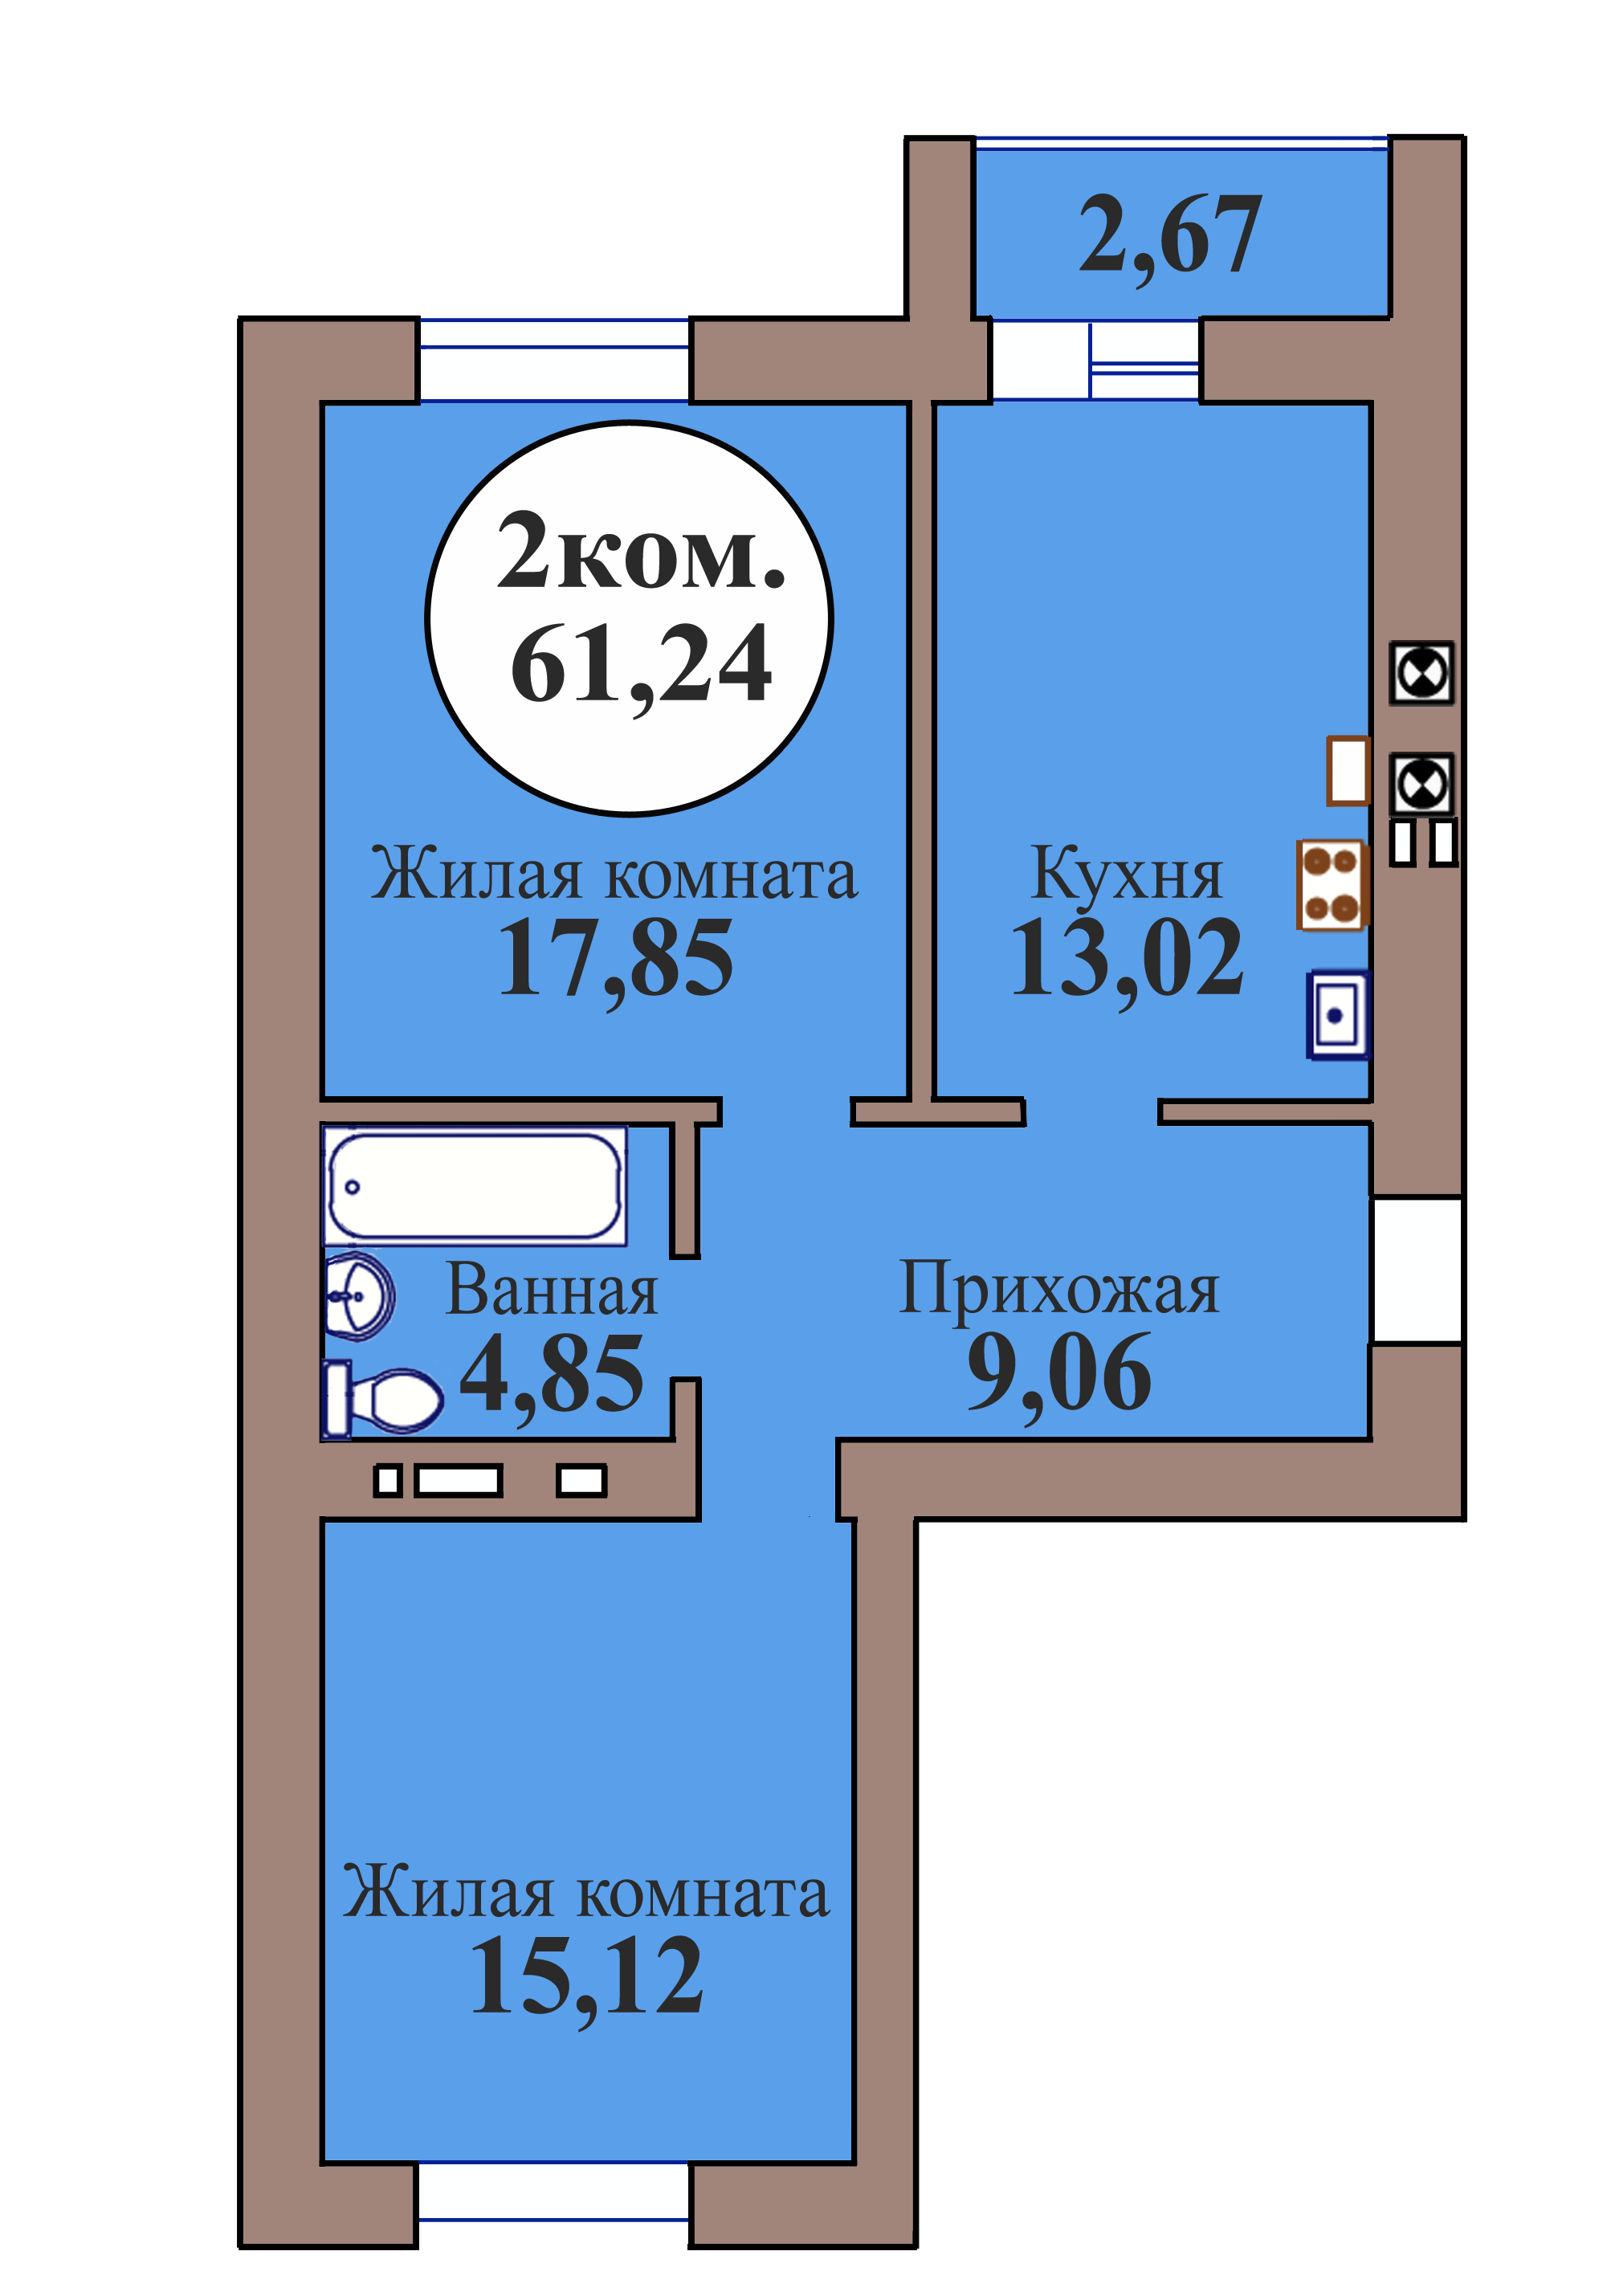 2-комн. кв. по пер. Калининградский, 5 кв. 145 в Калининграде